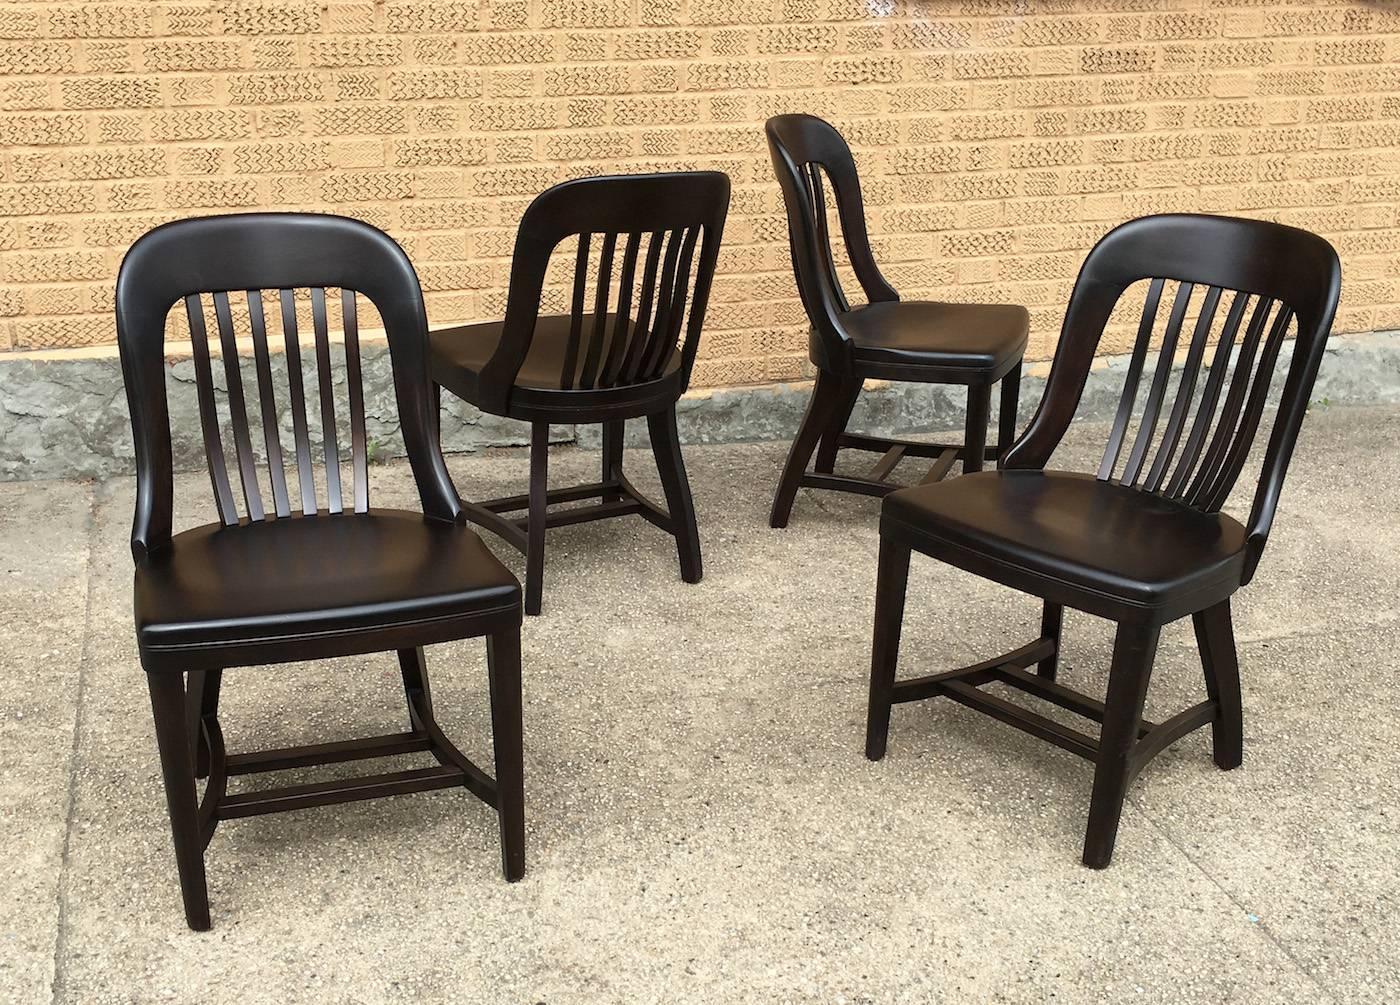 Pair Ebonized Gunlocke Bank of England Side Chairs For